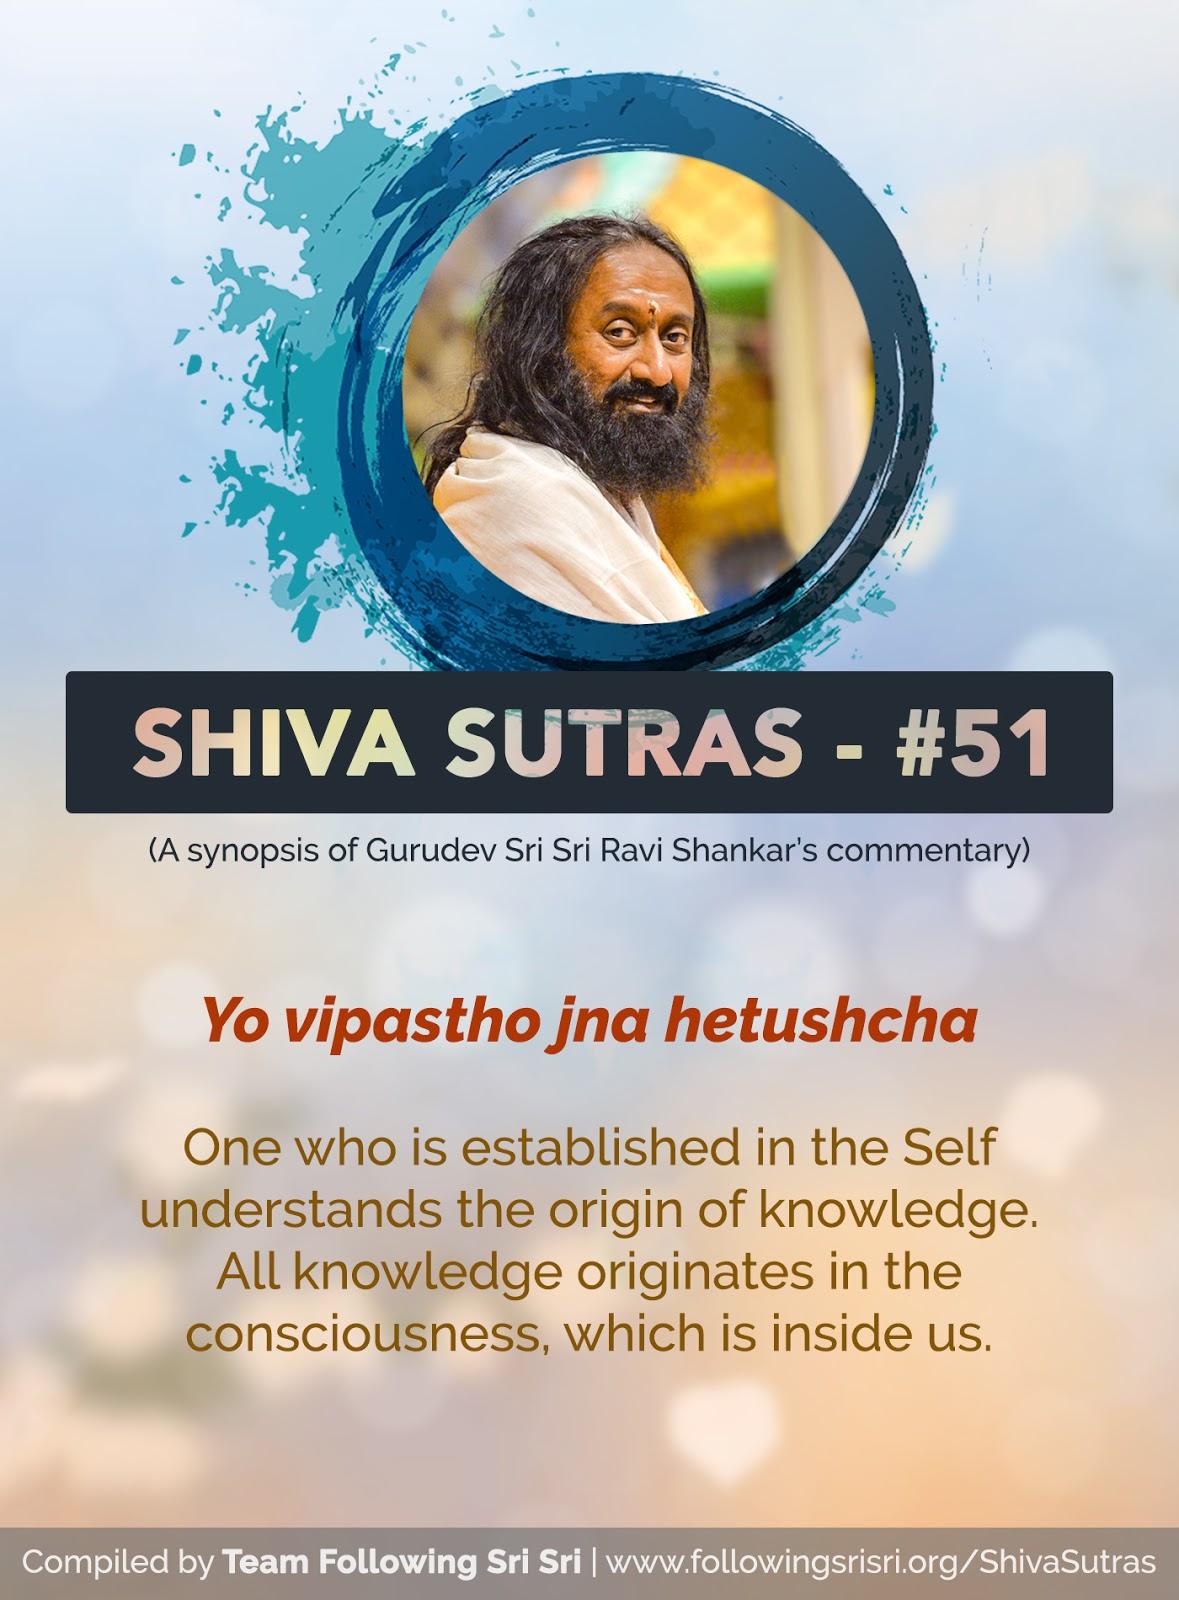 Shiva Sutras - Sutra 51